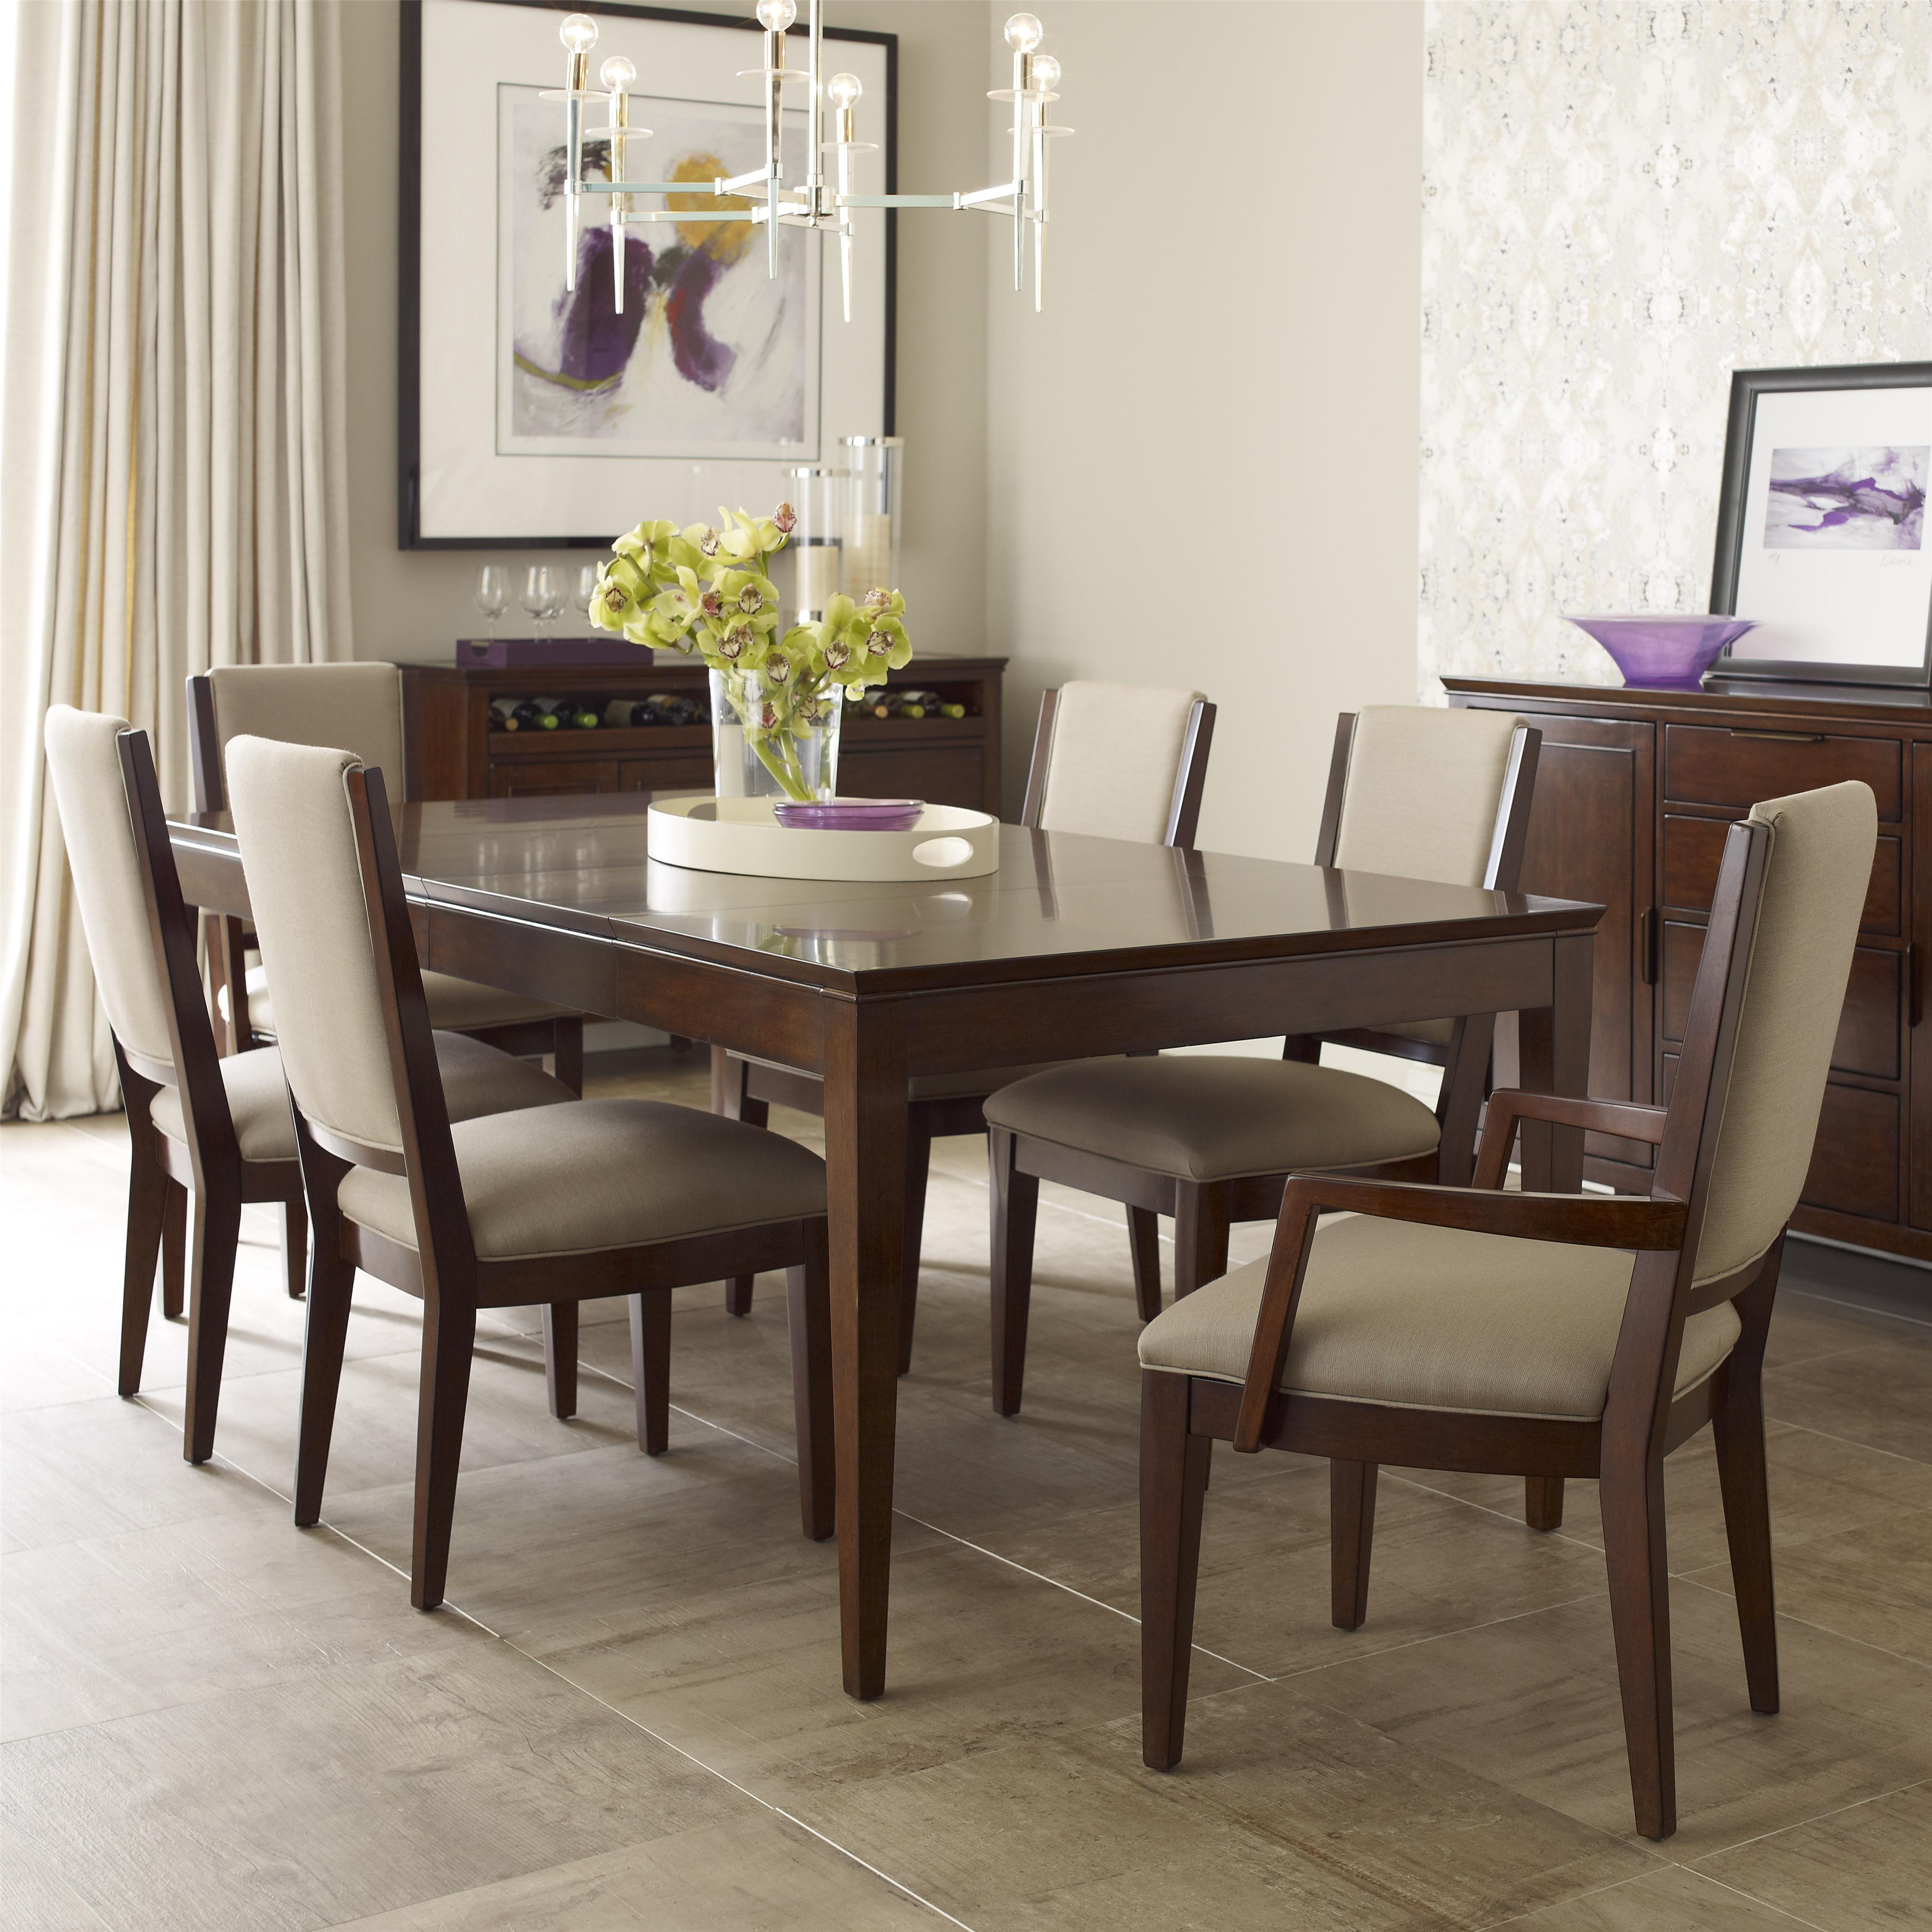 Elise 7 Pc Dining Set by Kincaid Furniture at Johnny Janosik